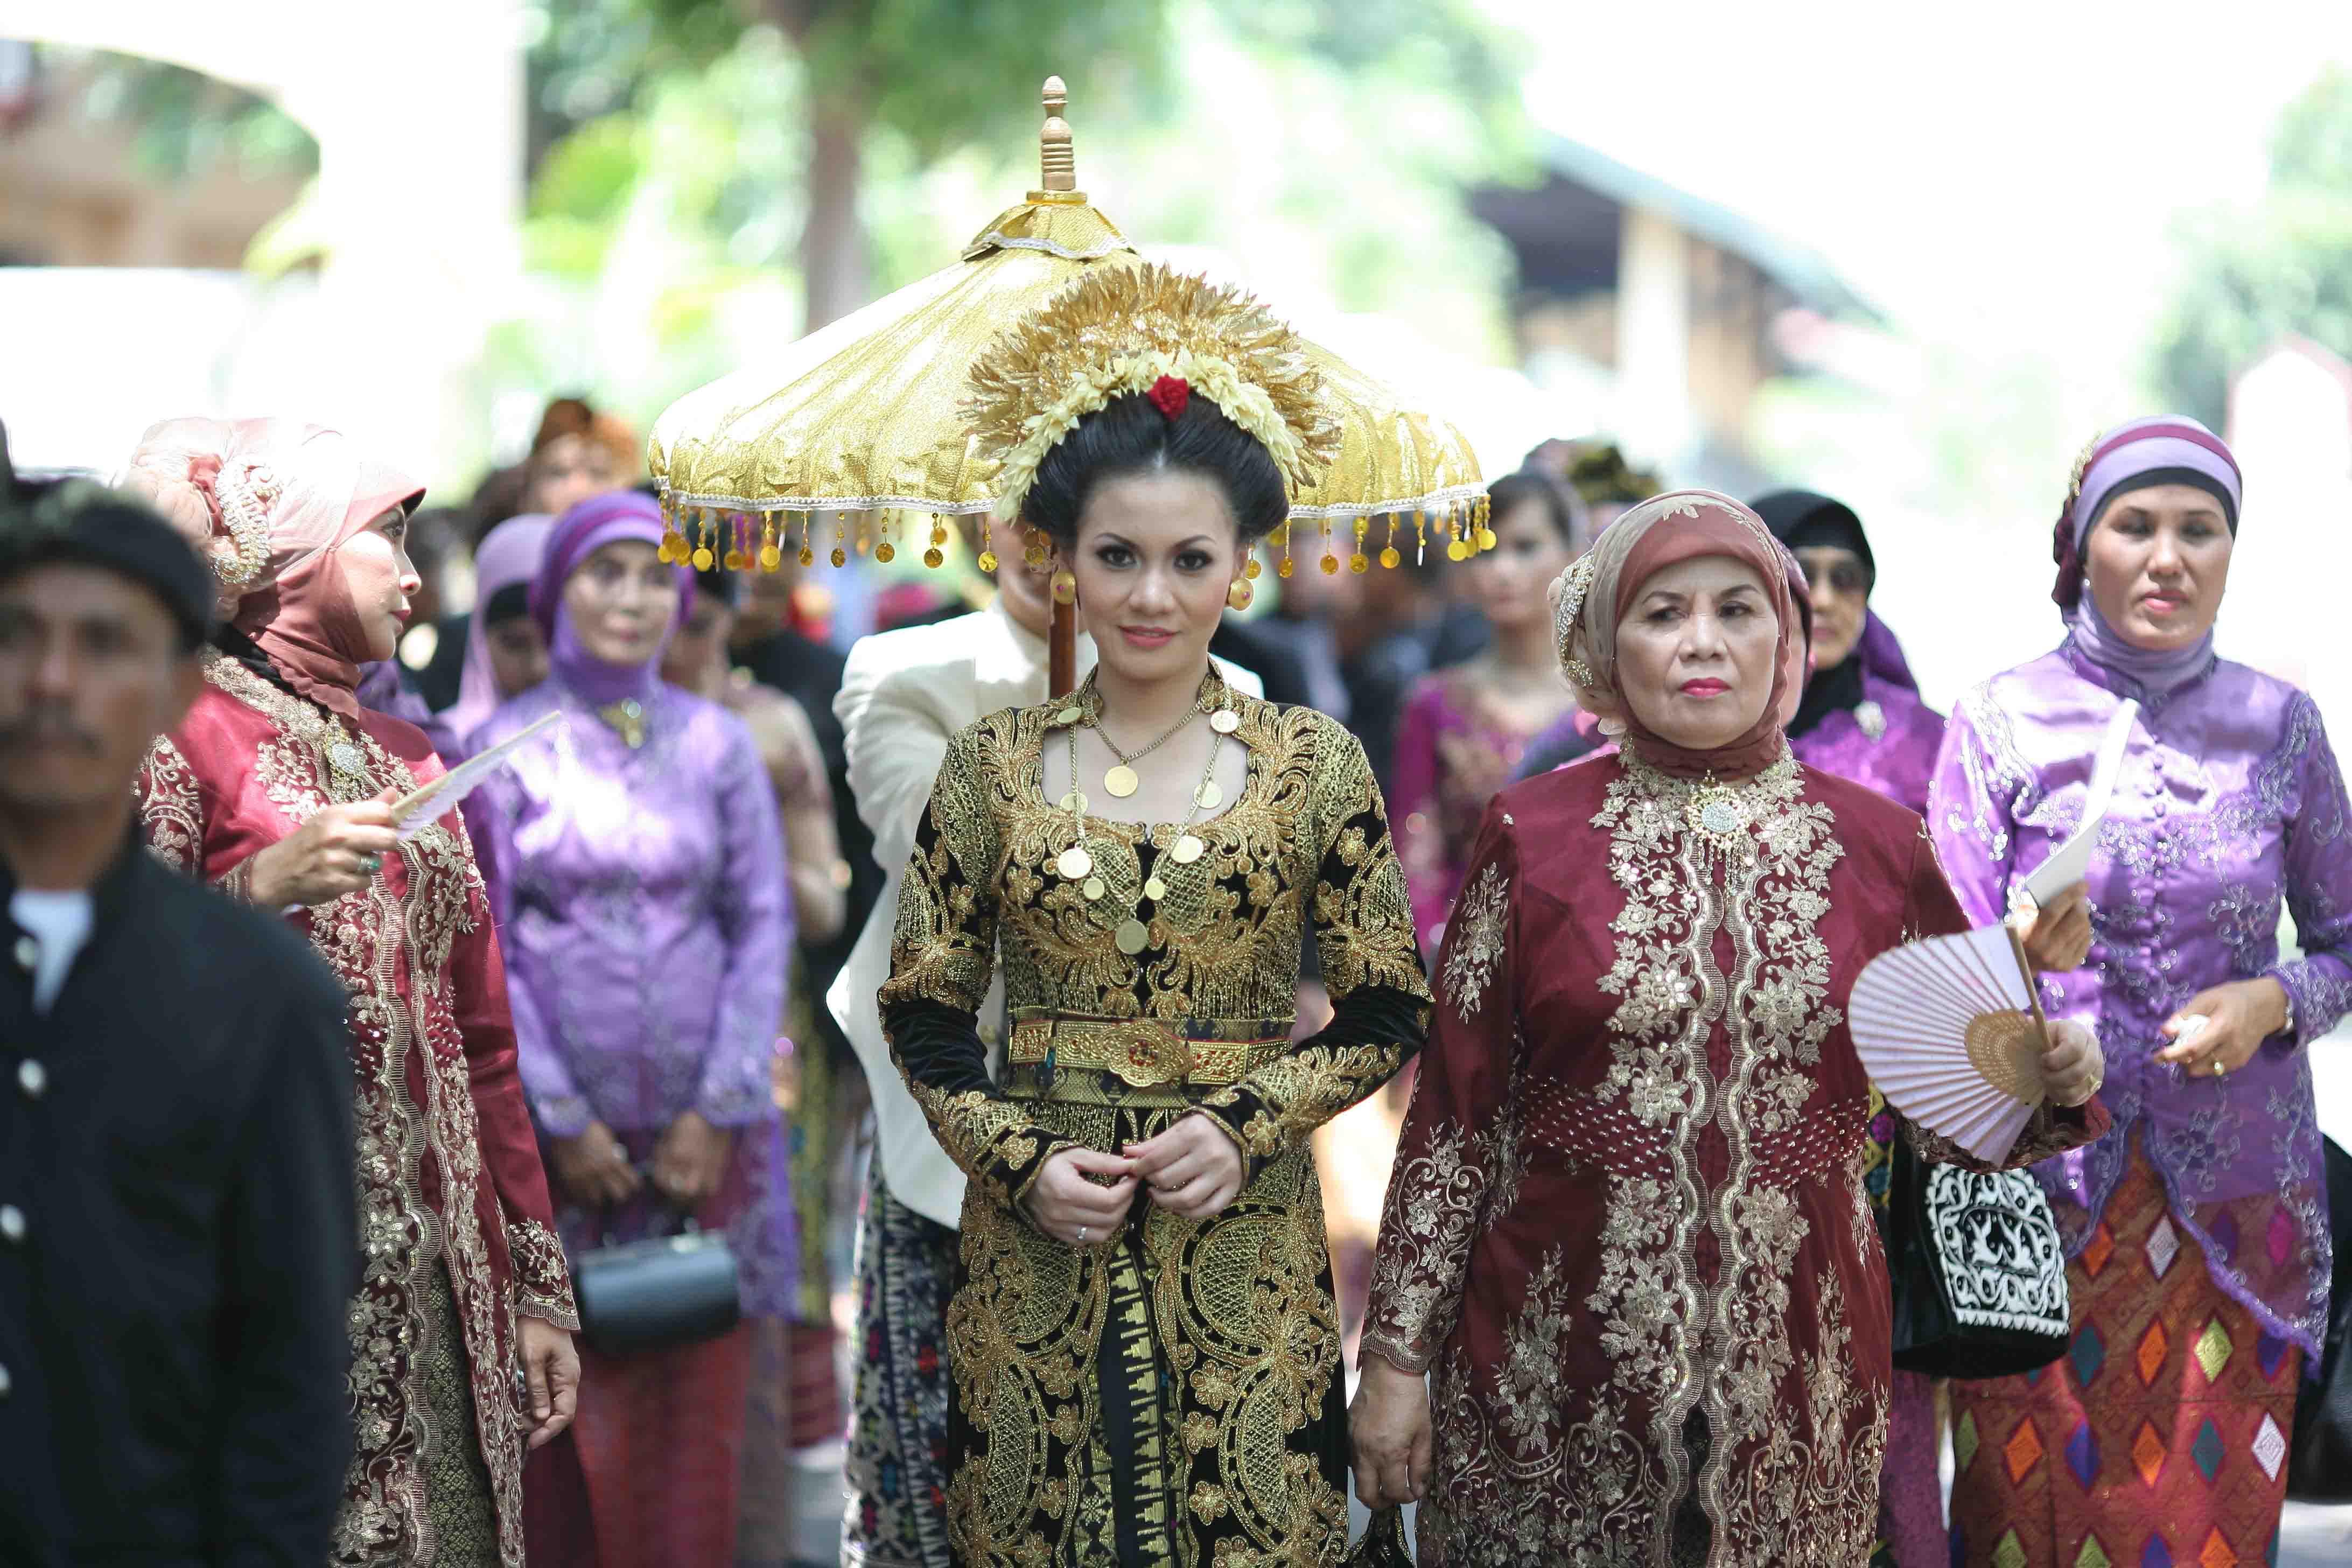 Adat Pernikahan Suku Sasak di Lombok yang Unik